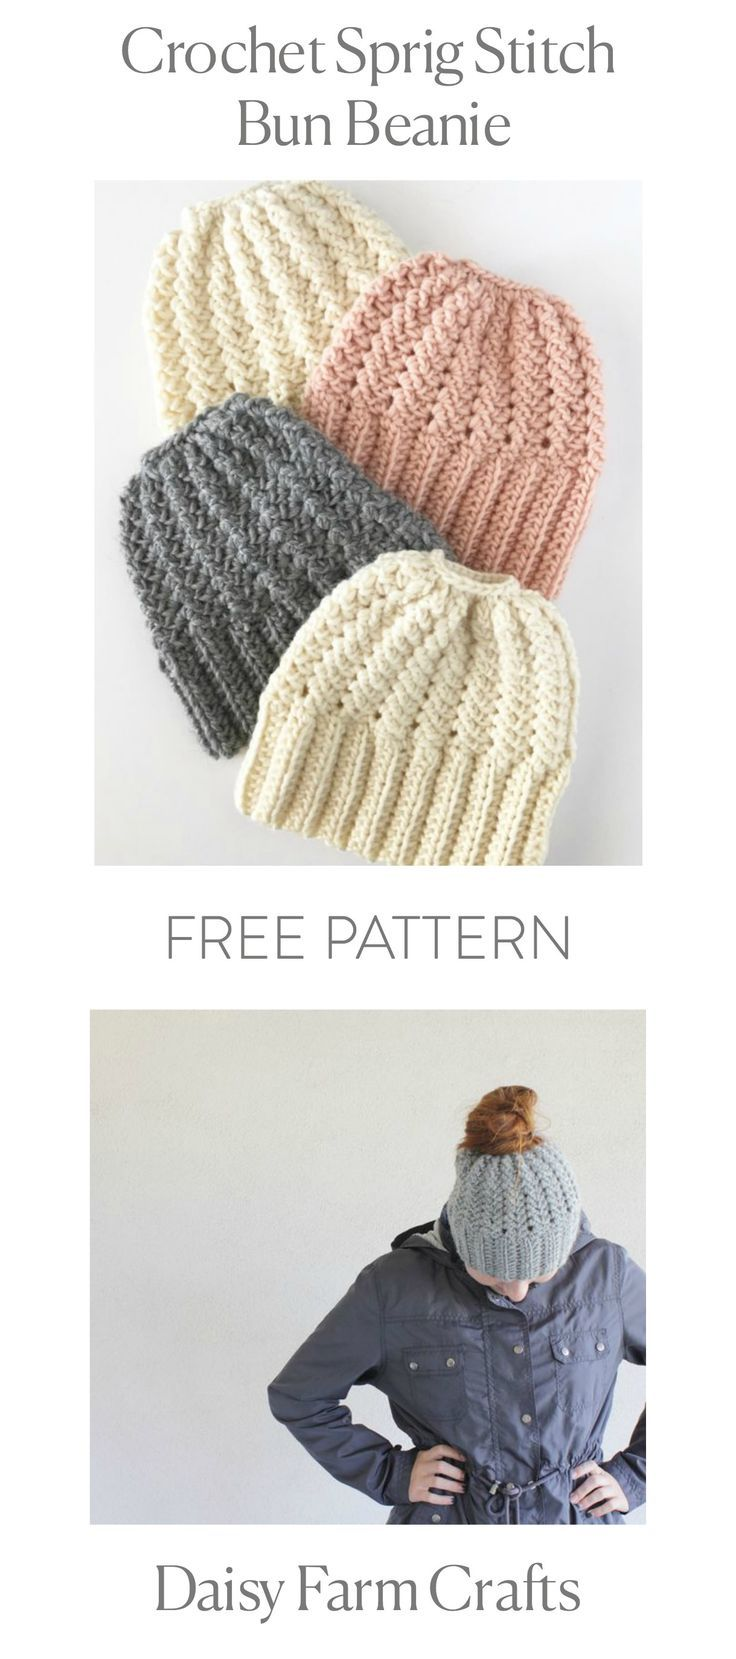 FREE PATTERN - Crochet Sprig Stitch Bun Beanie | Crochet | Pinterest ...